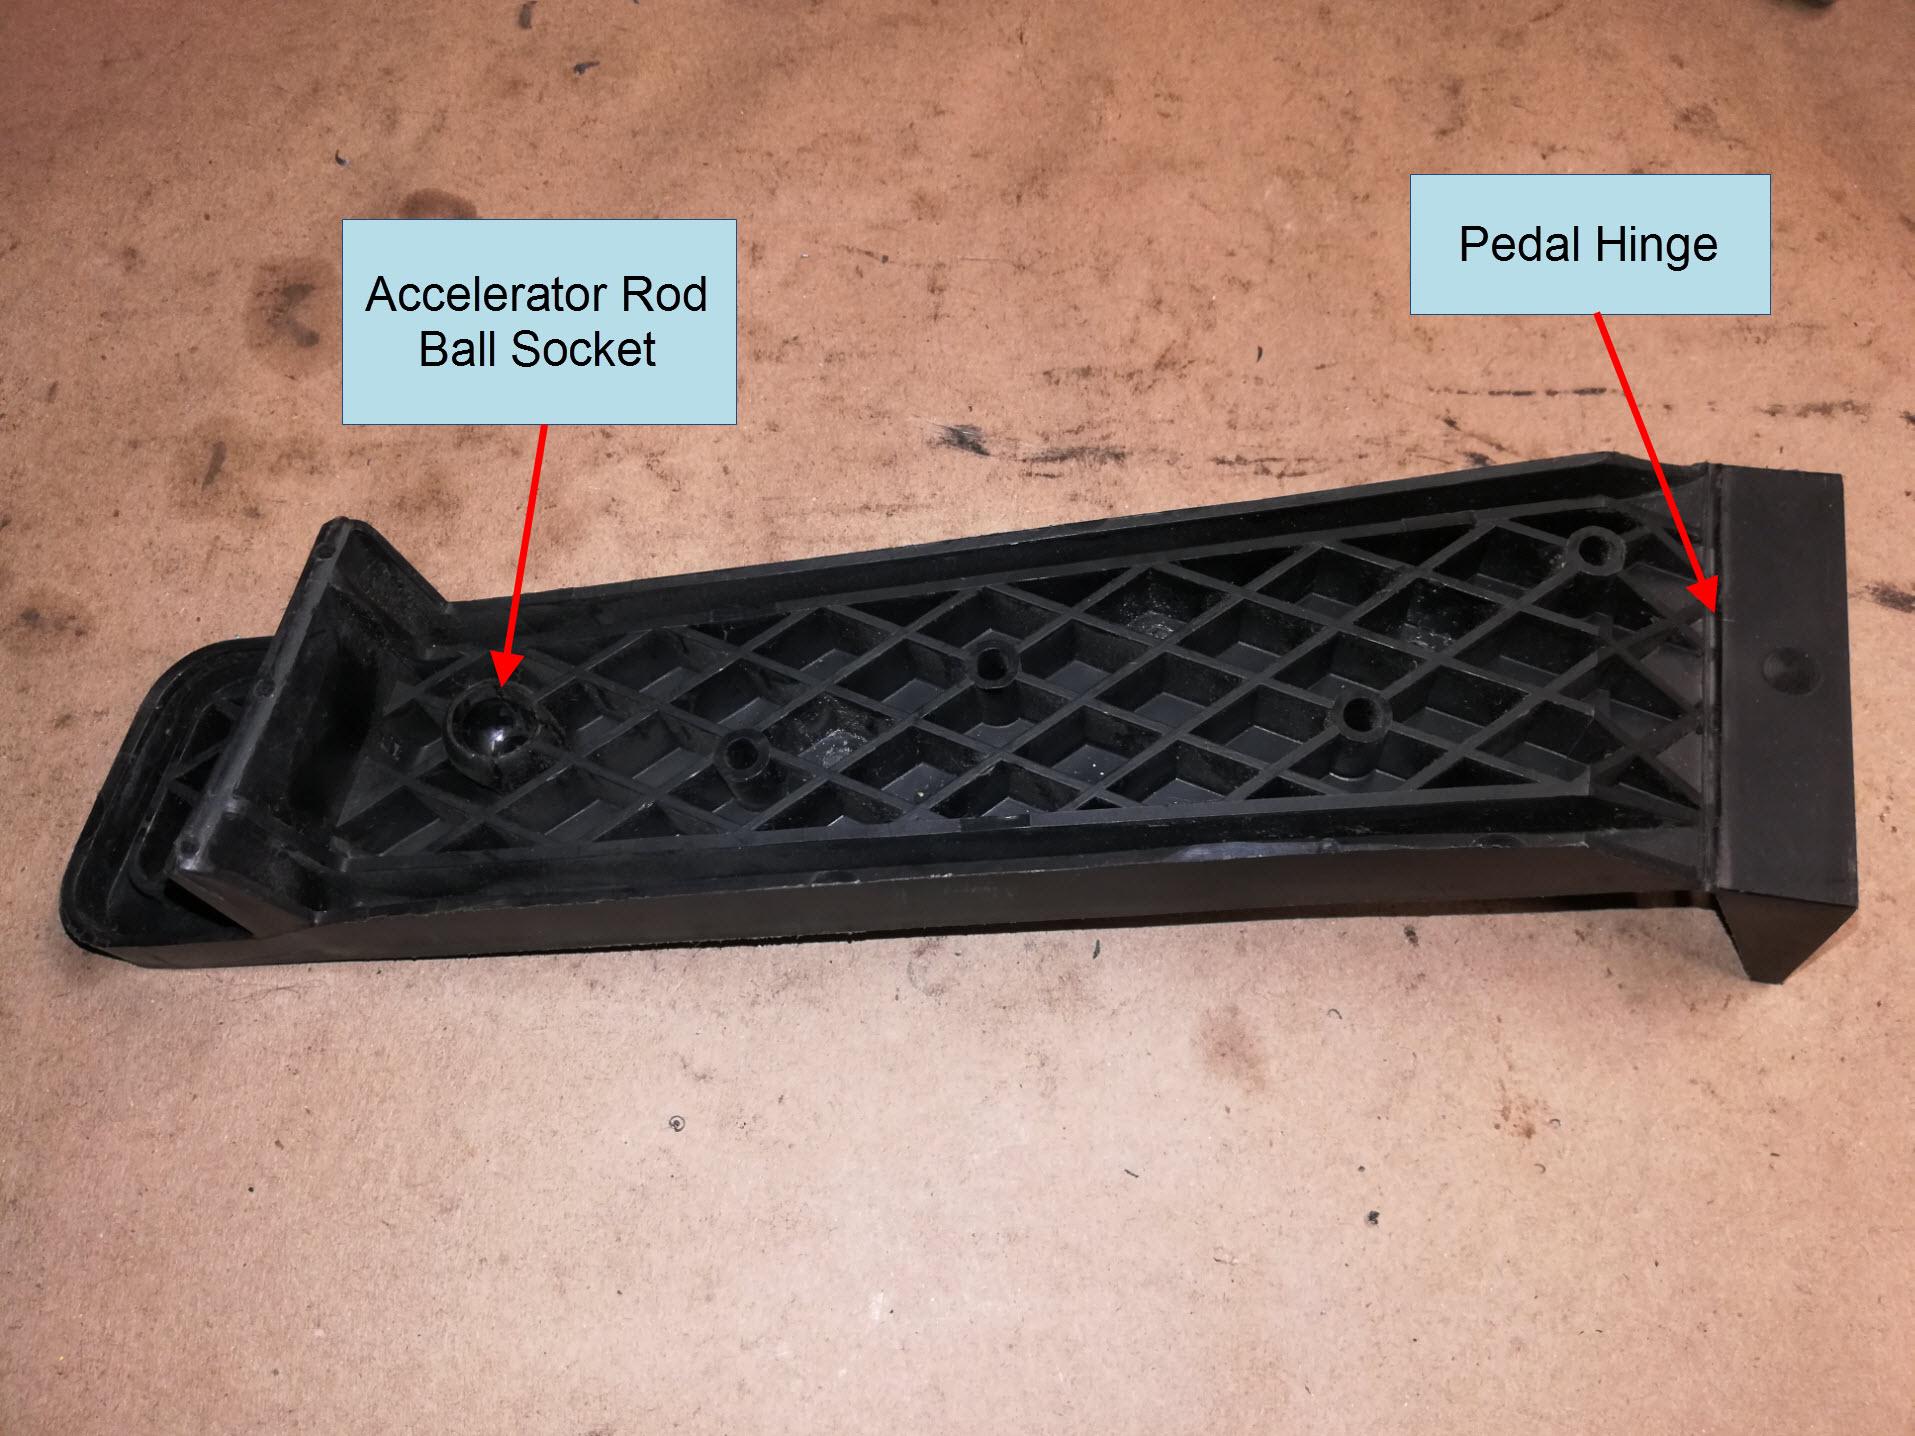 Air-cooled Porsche 911 accelerator pedal detail.